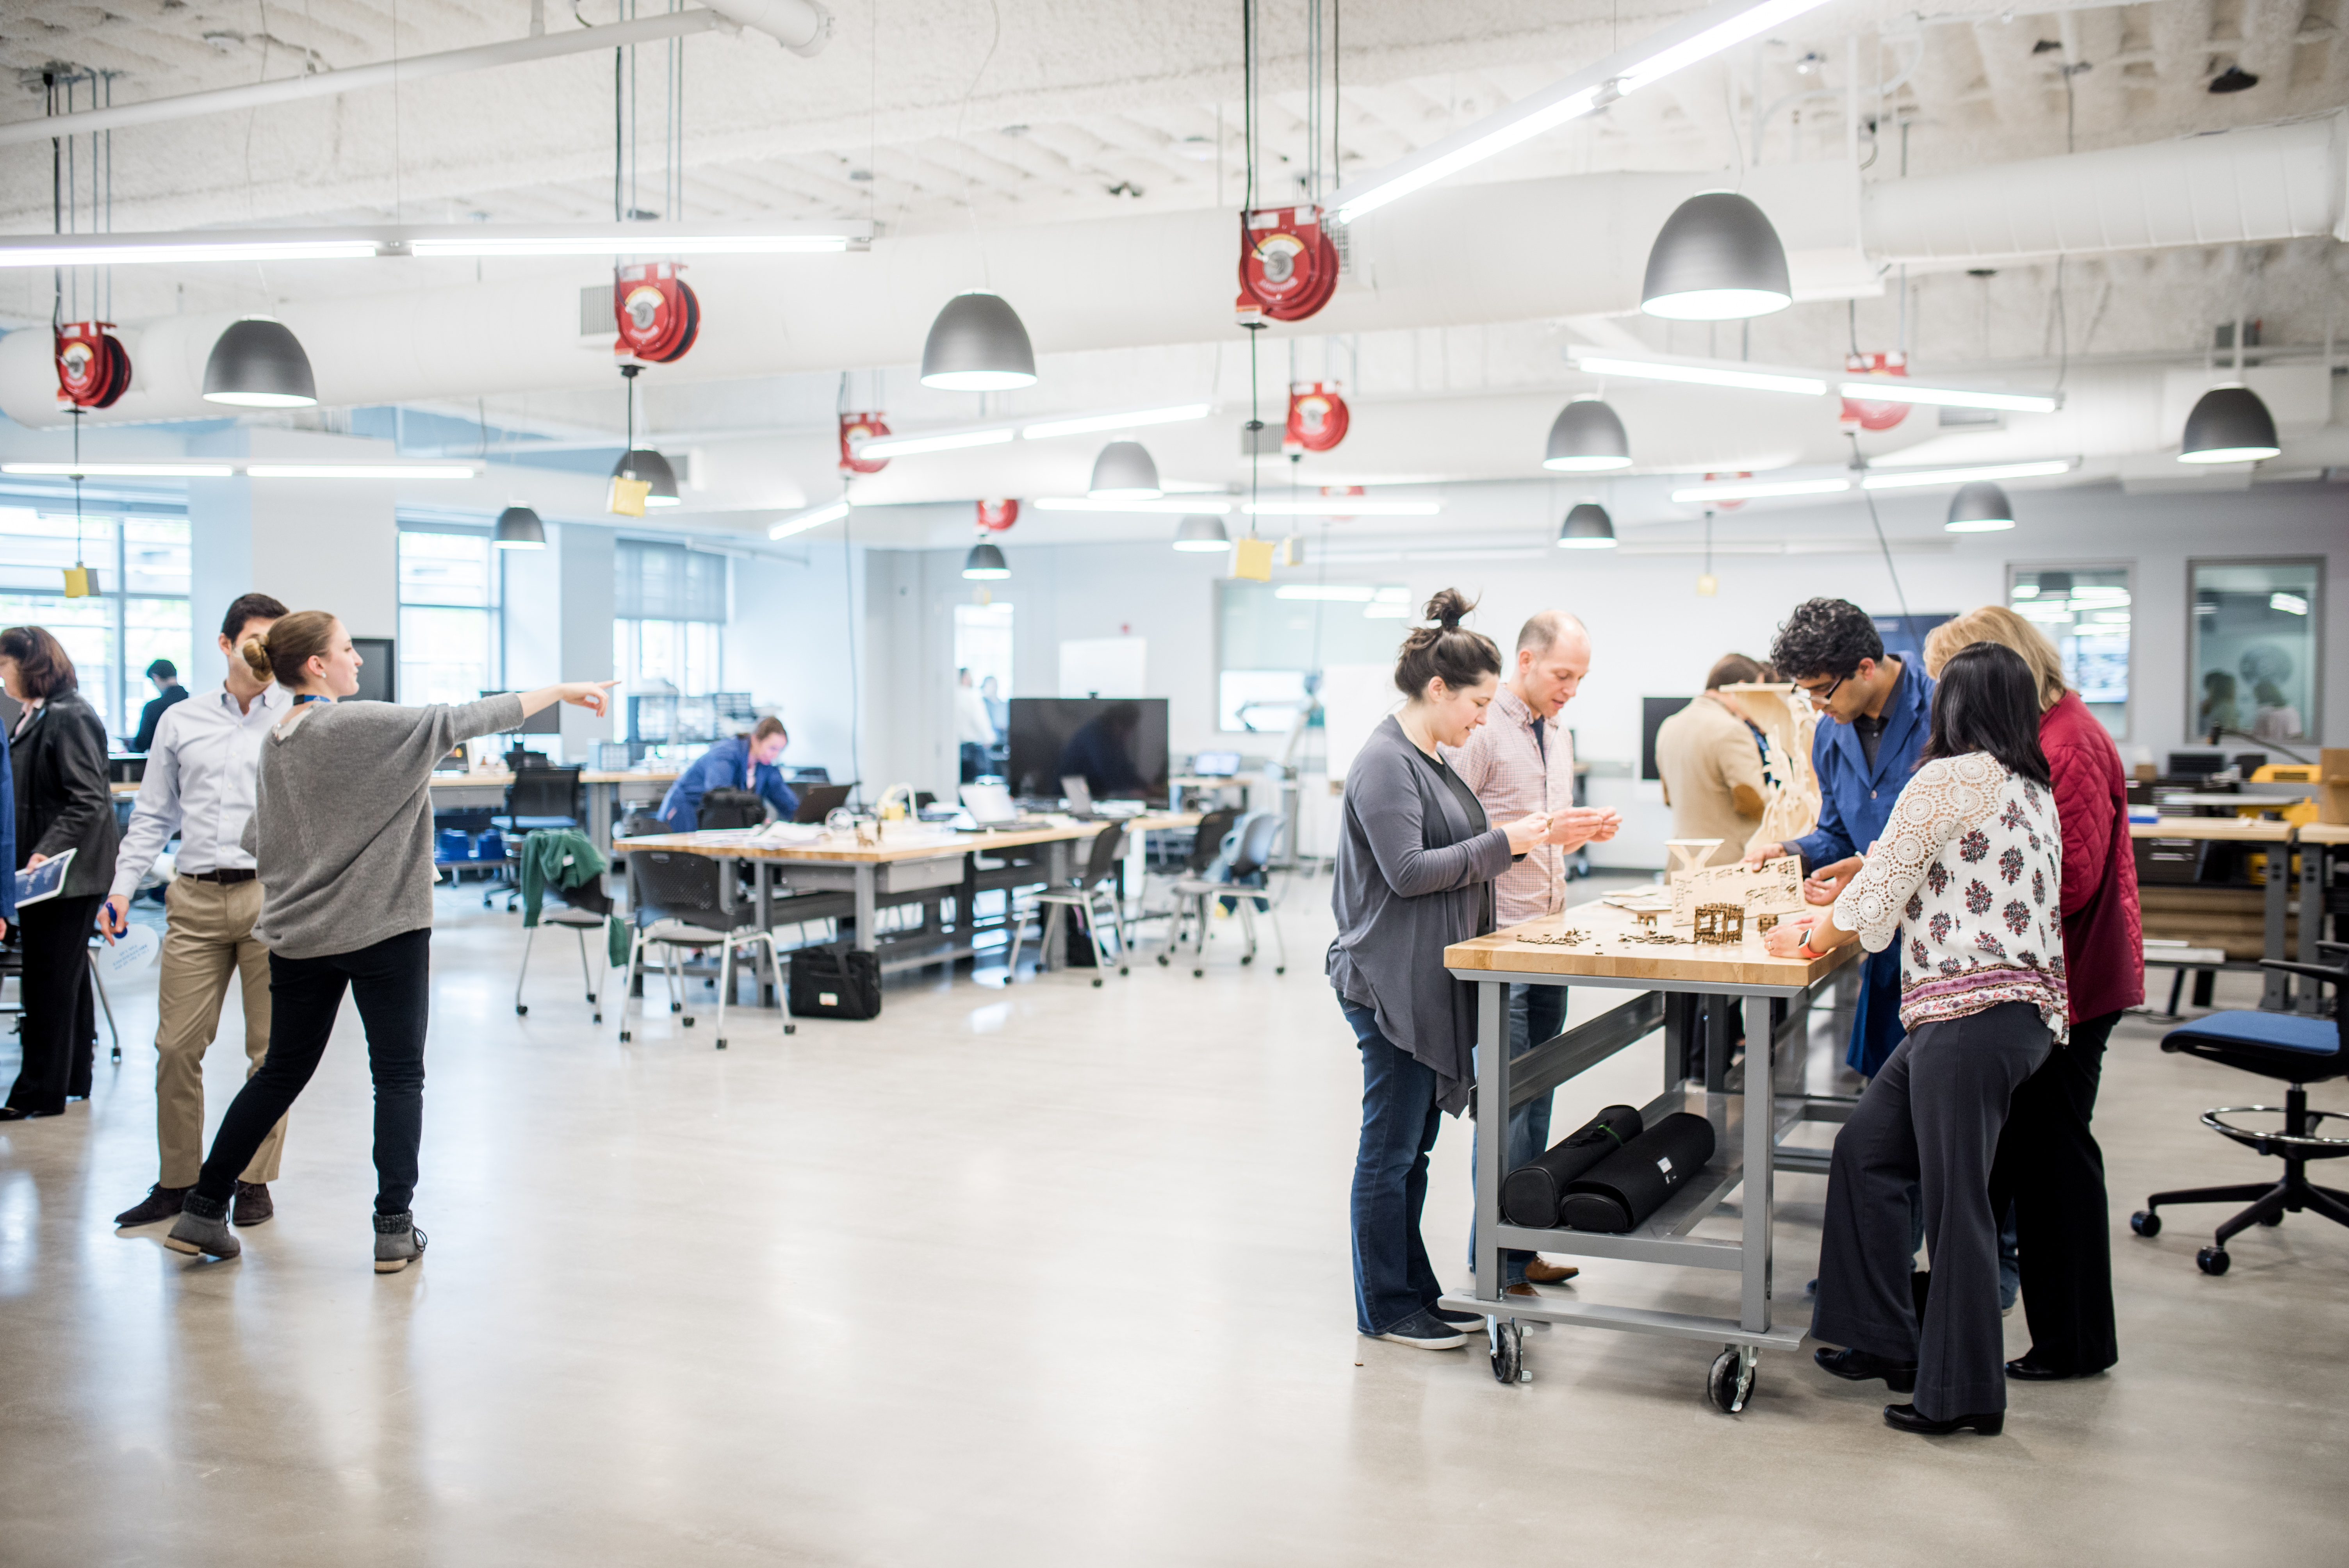 3DEXPERIENCE Lab Boston > Dassault Systèmes®